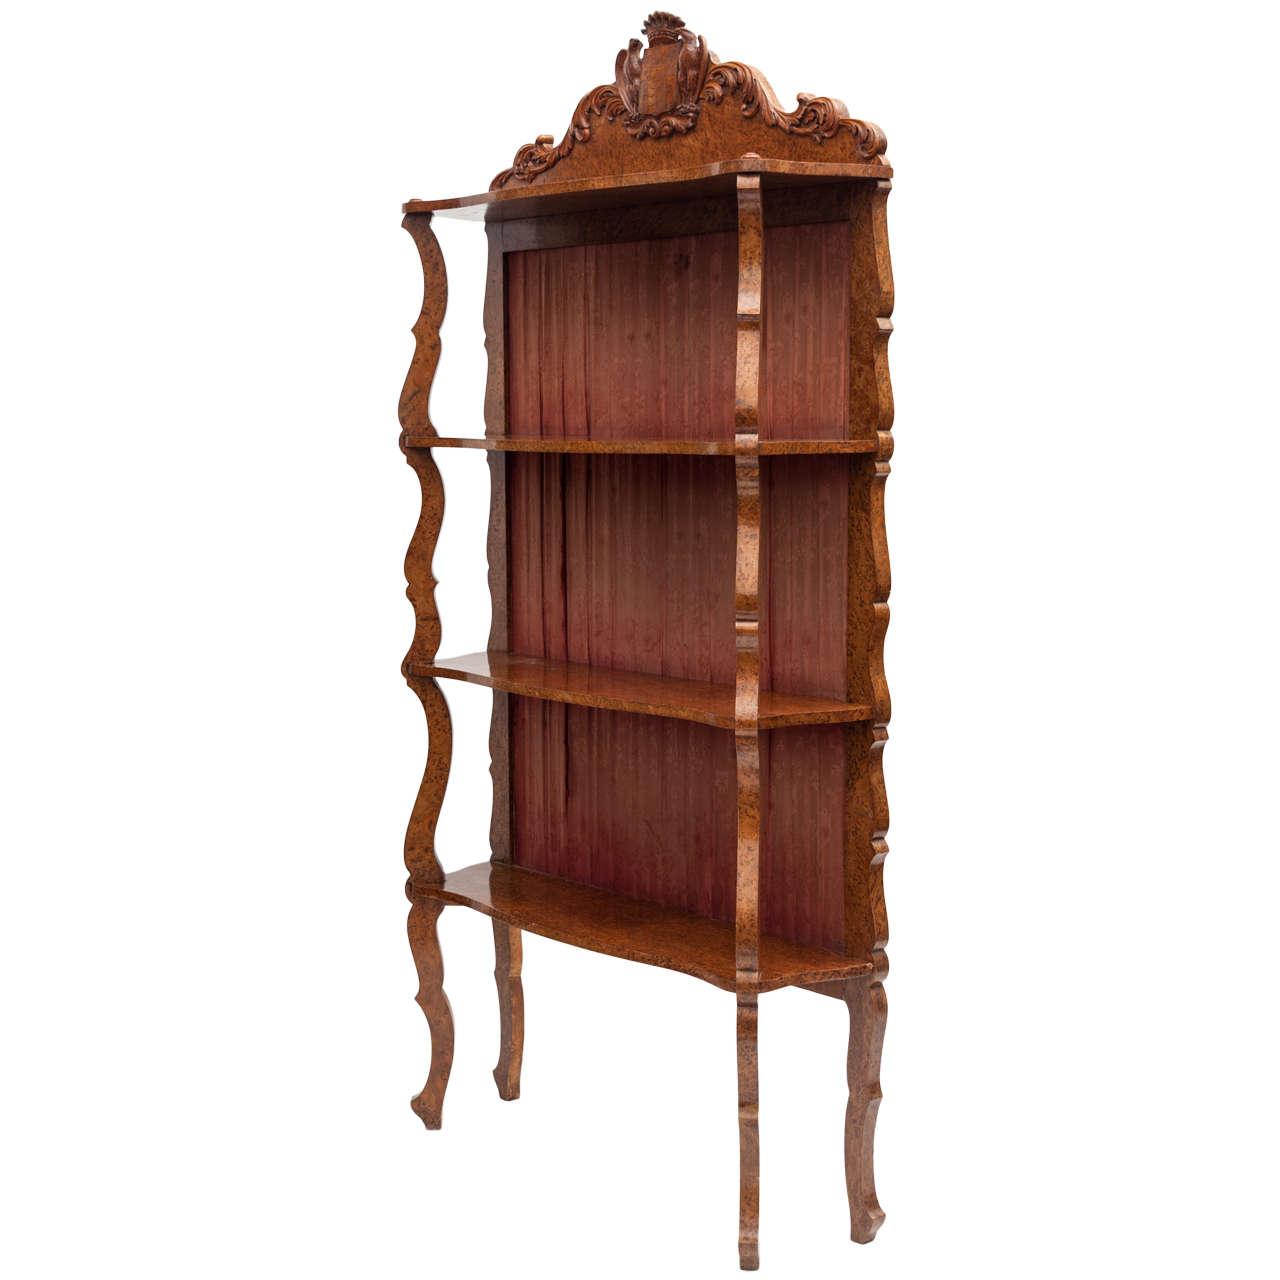 Mid C19th Amboyna Etagere / Standing Shelves